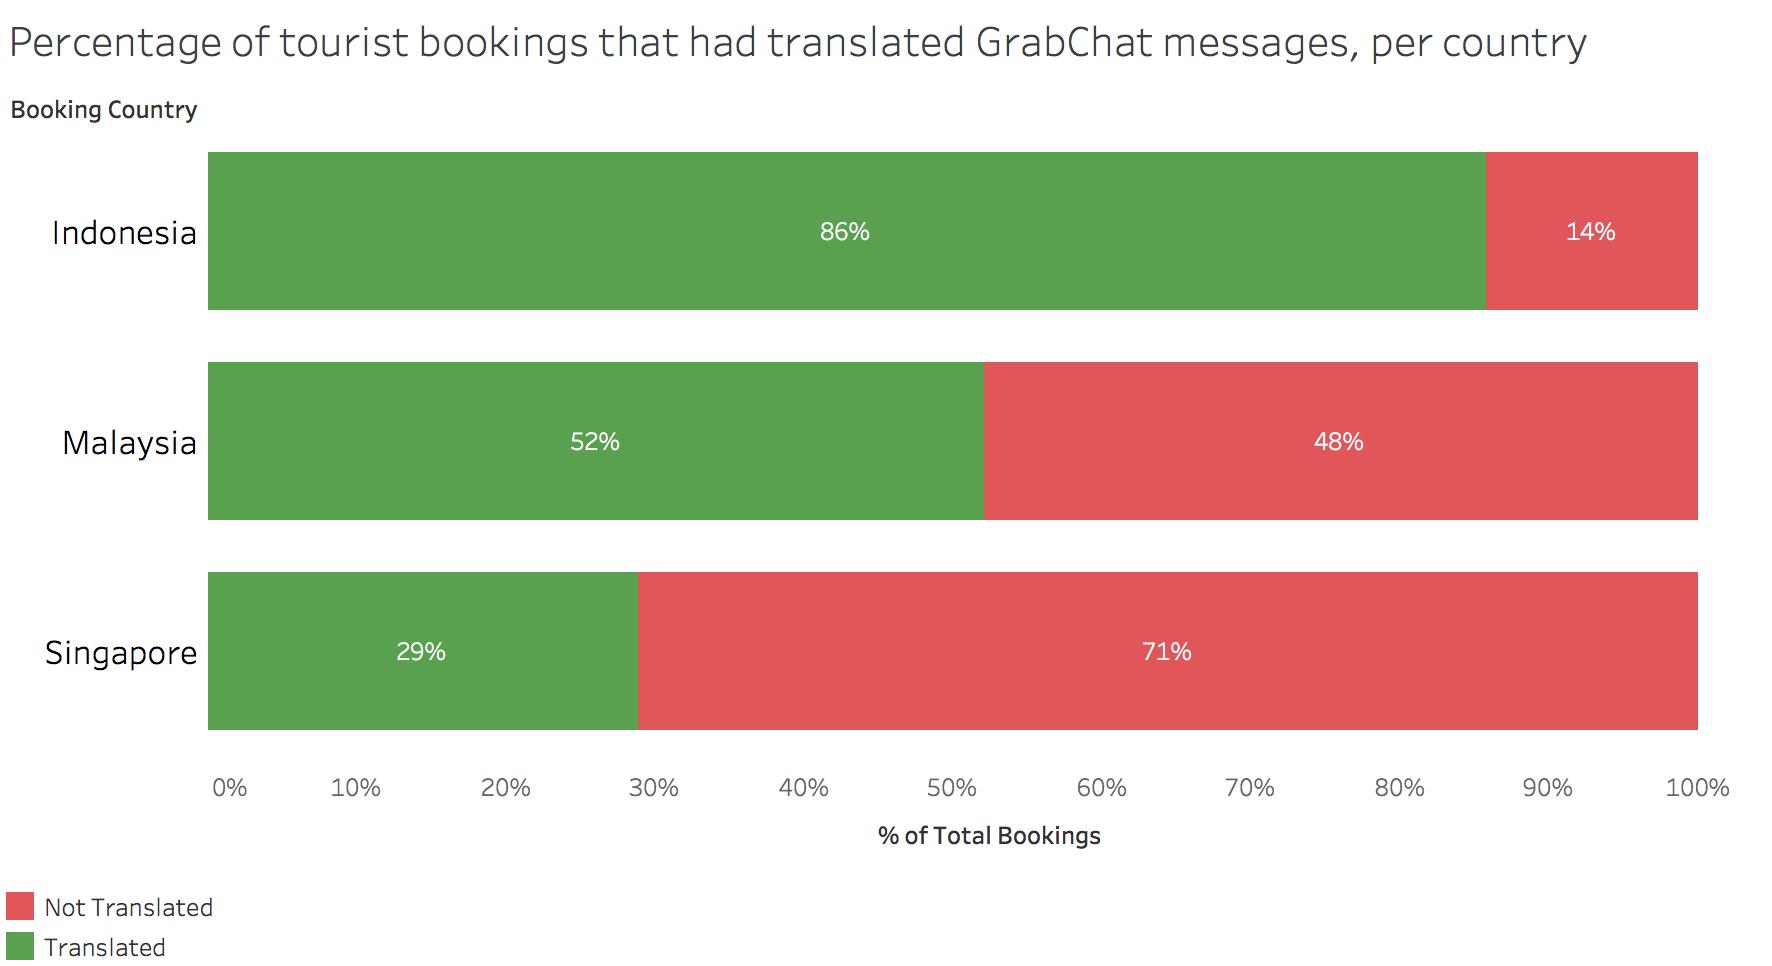 Percentage of translated GrabChat messages